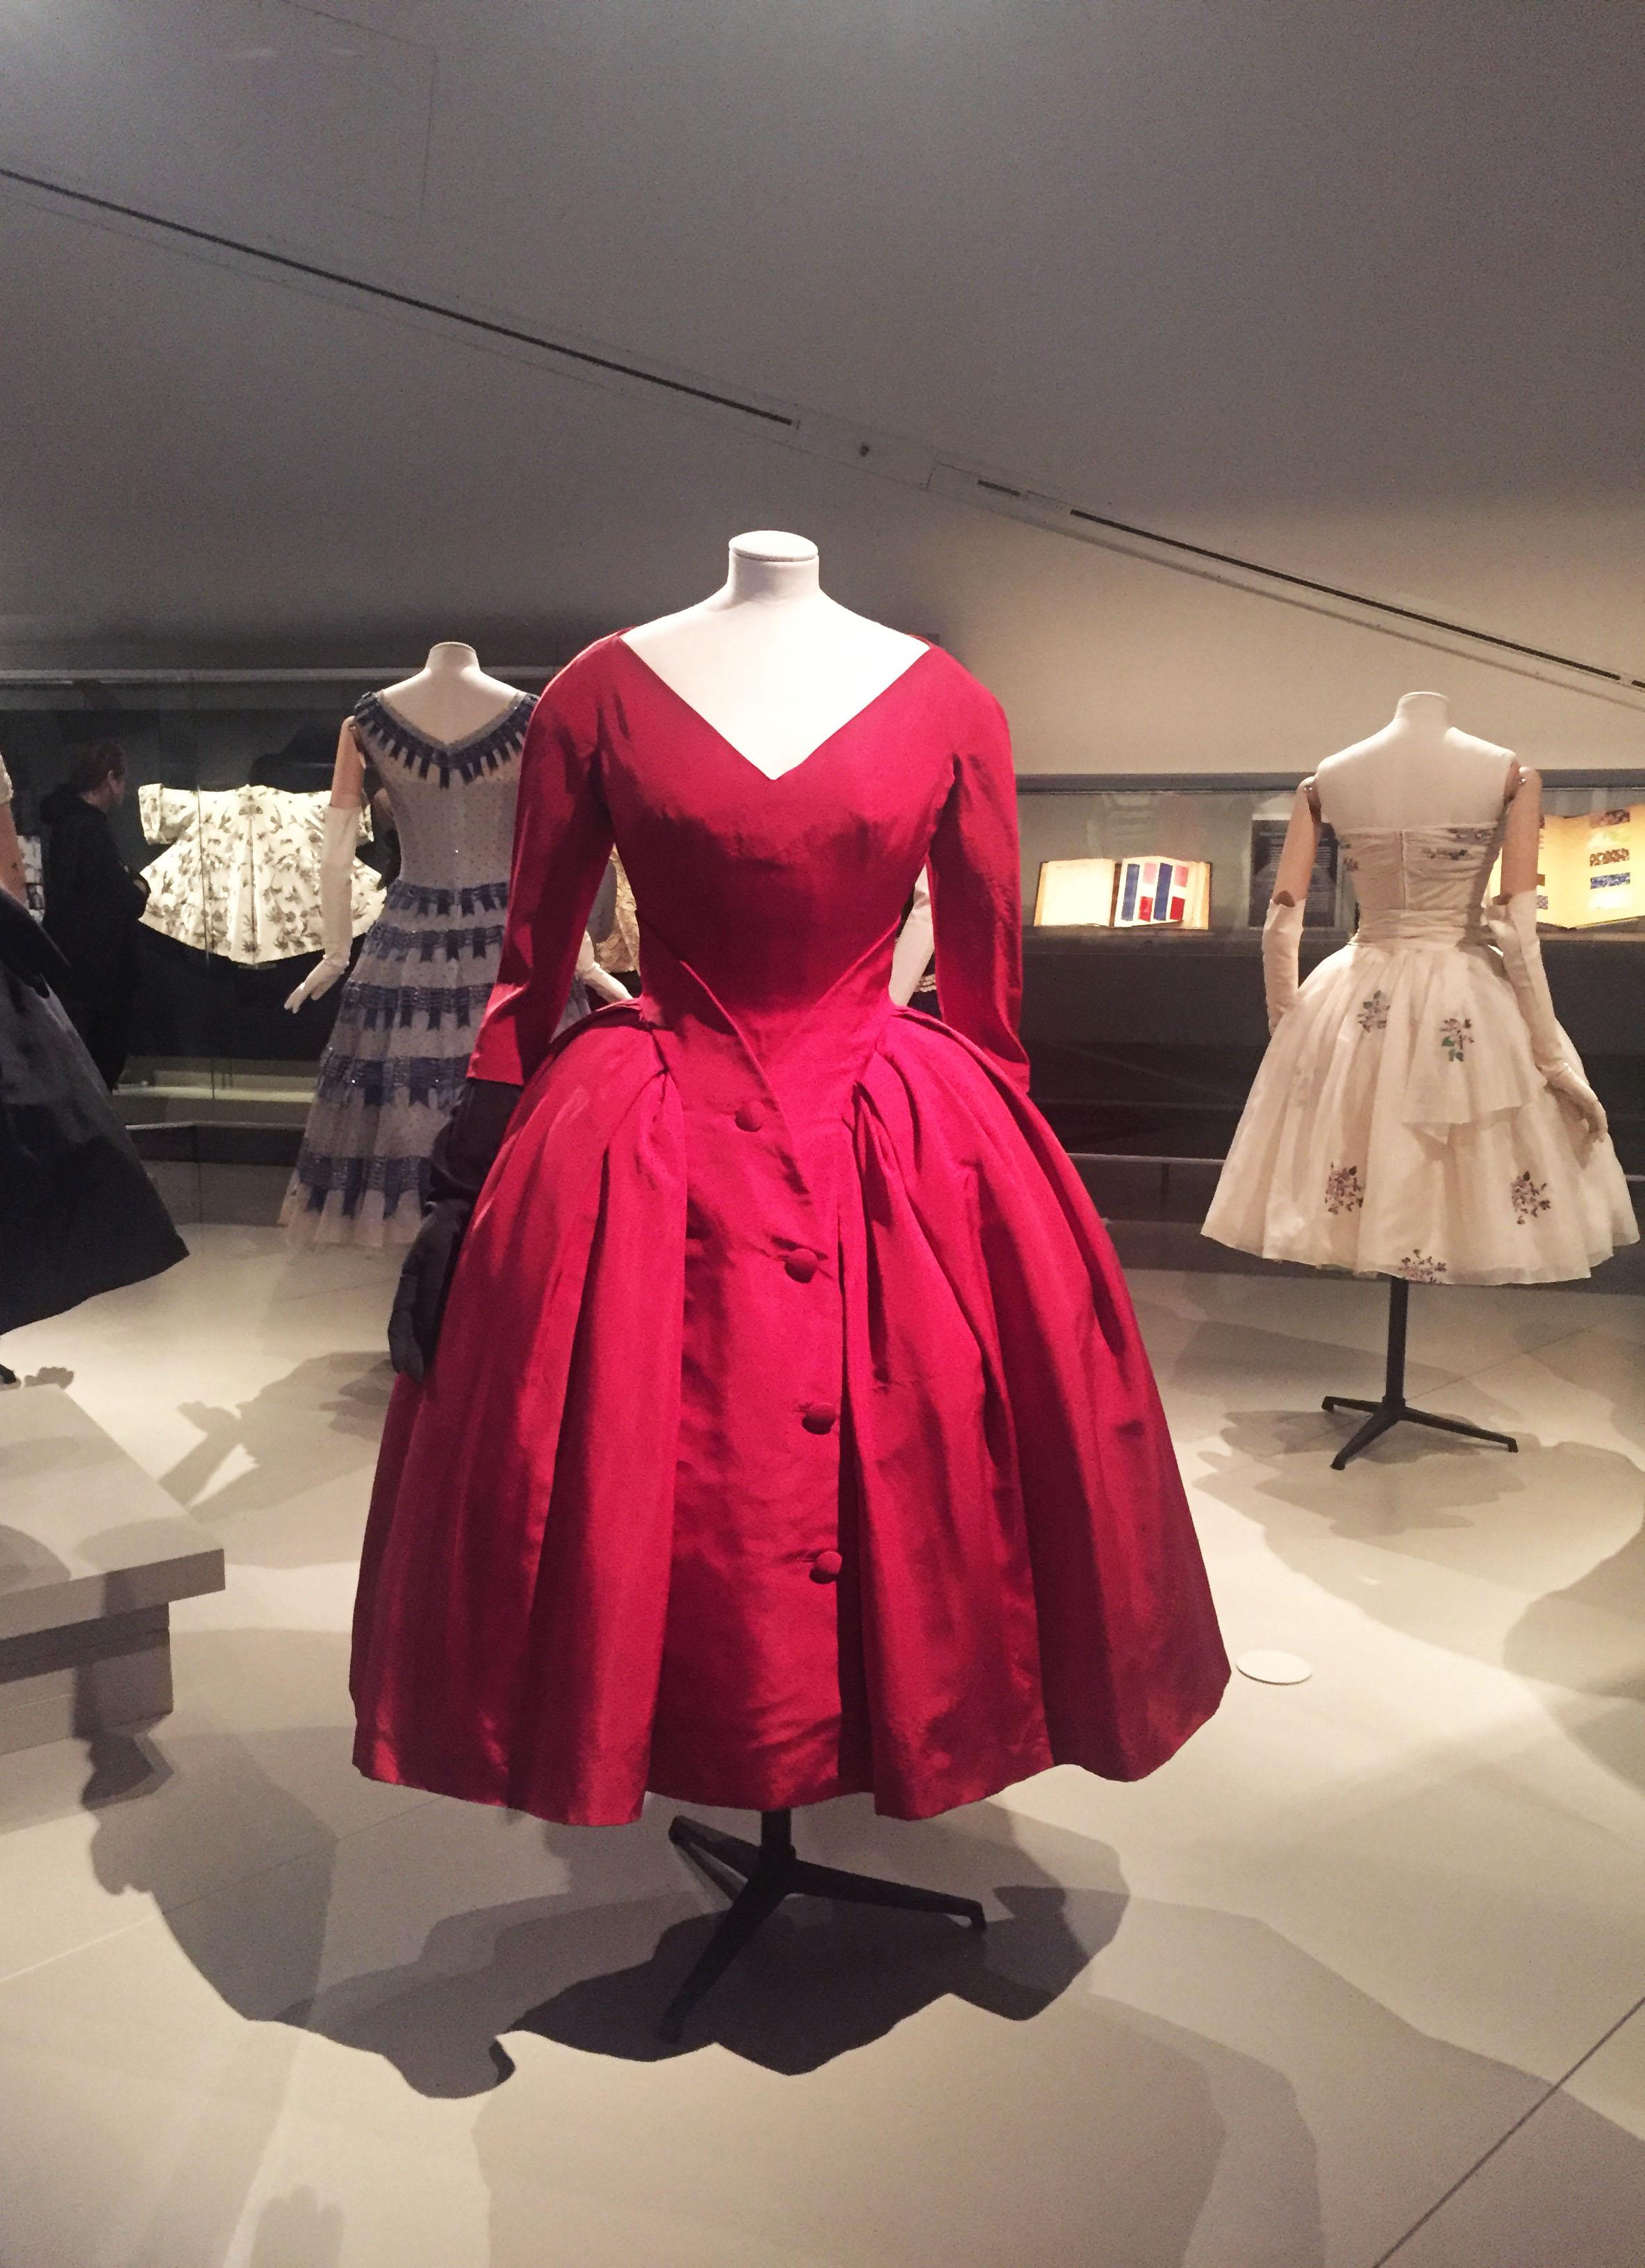 Dior Red Dress copy.jpg